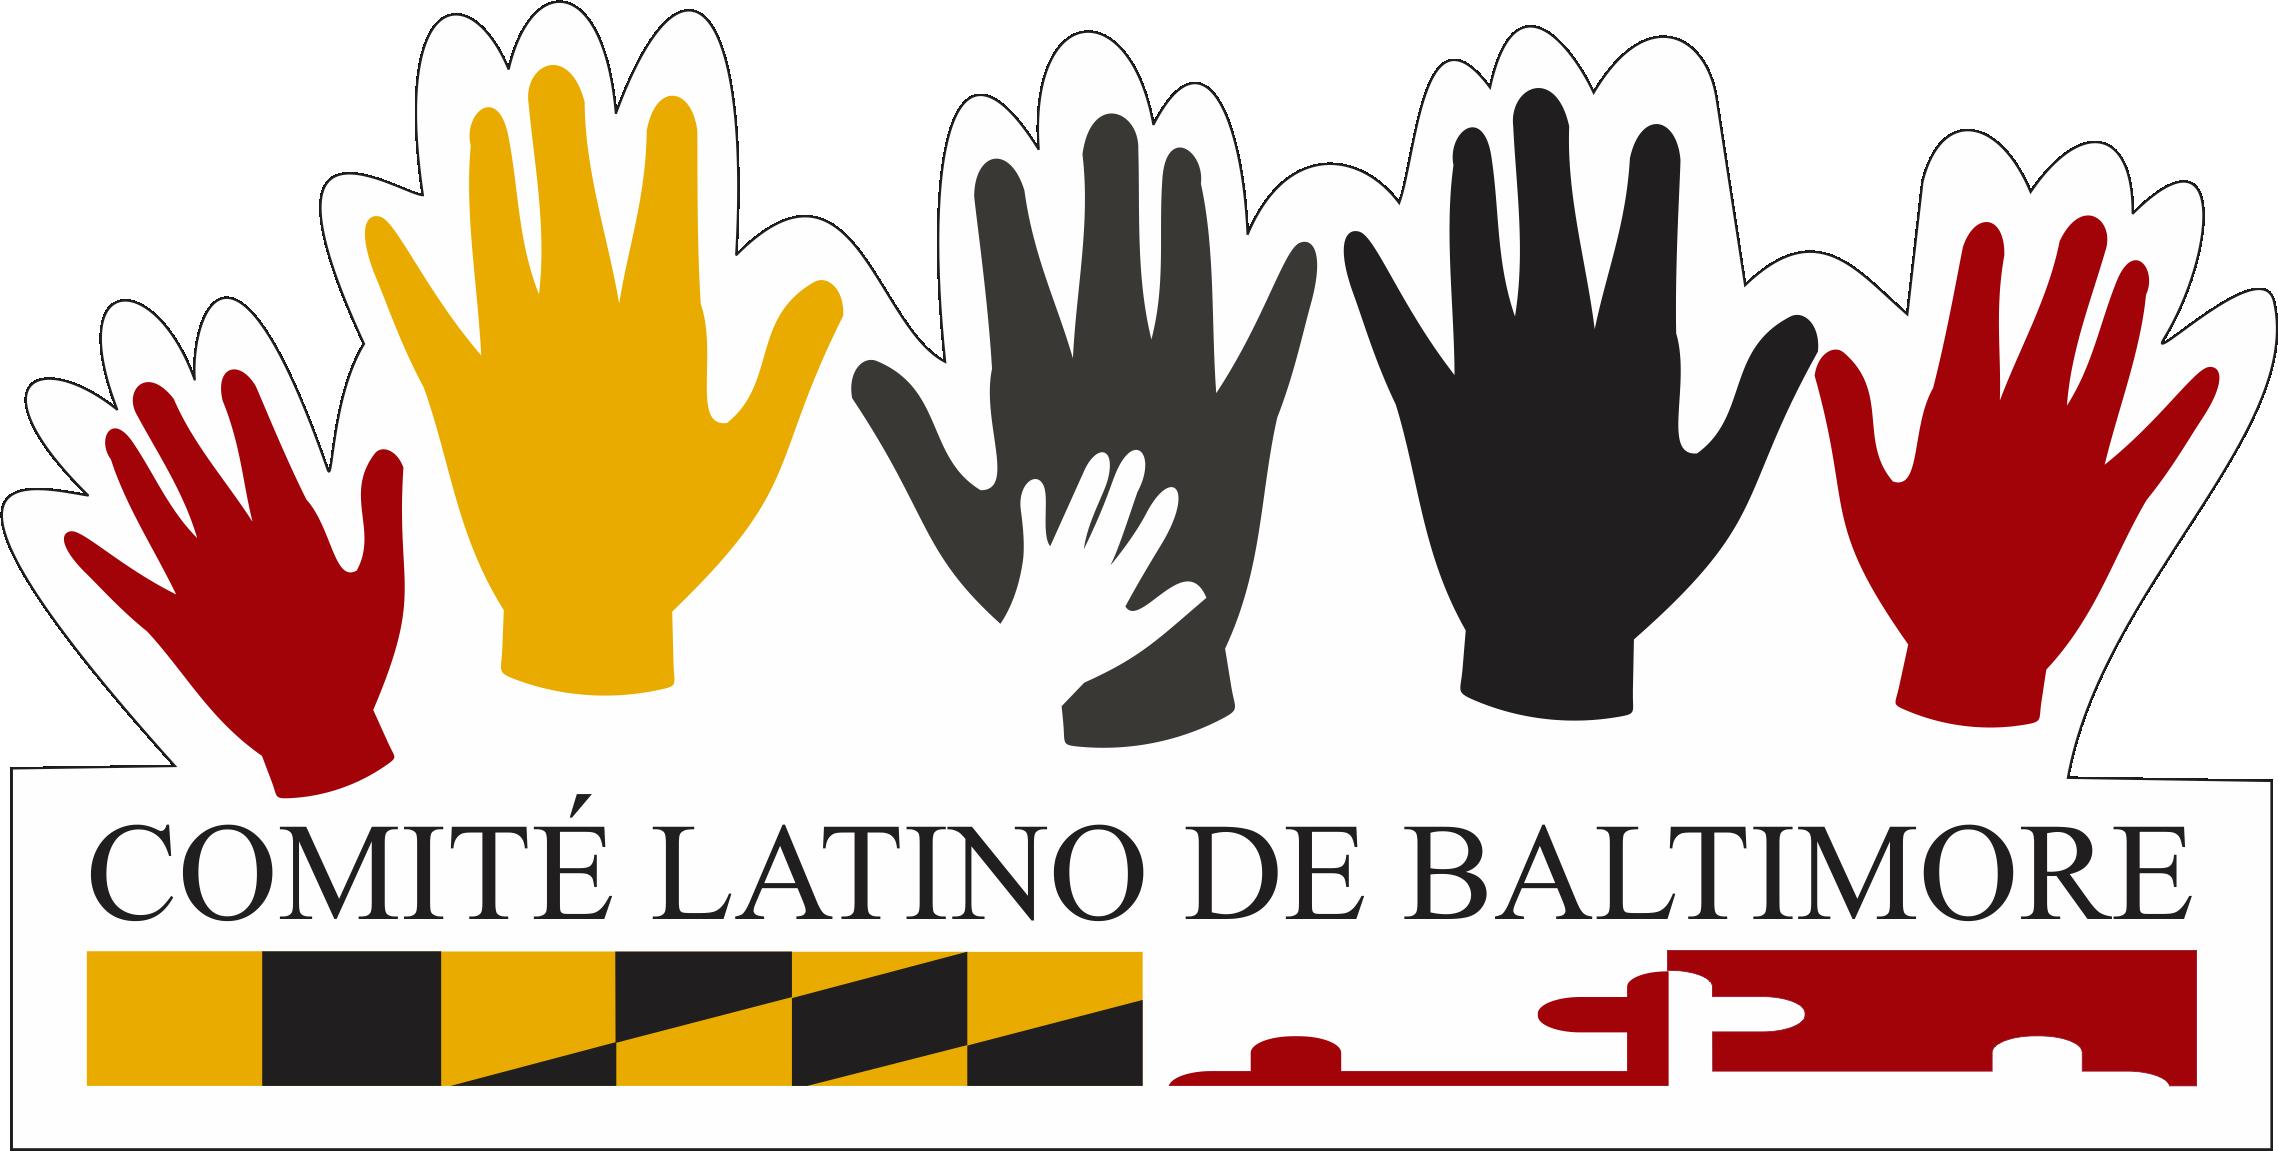 Stickers Comite Latino.png